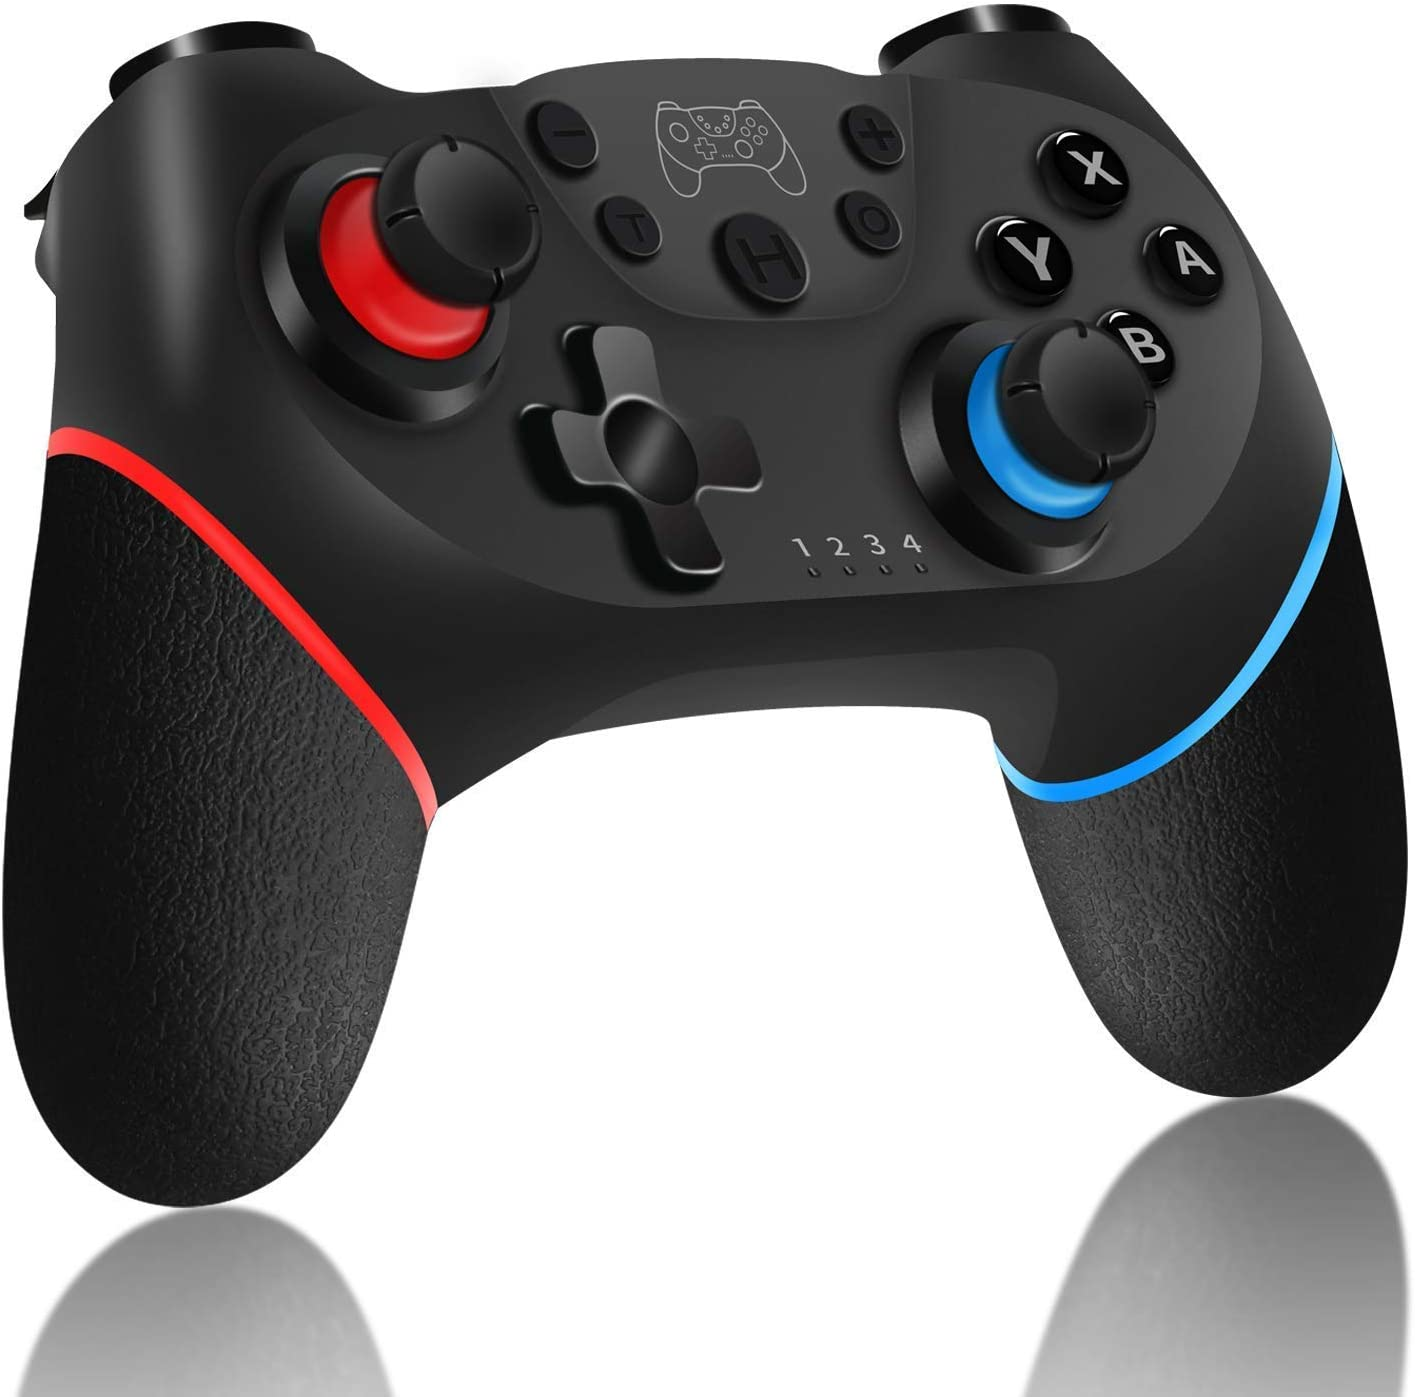 RegeMoudal Wireless Pro Controller Gamepad Joypad Remote Joystick $21.24 Coupon